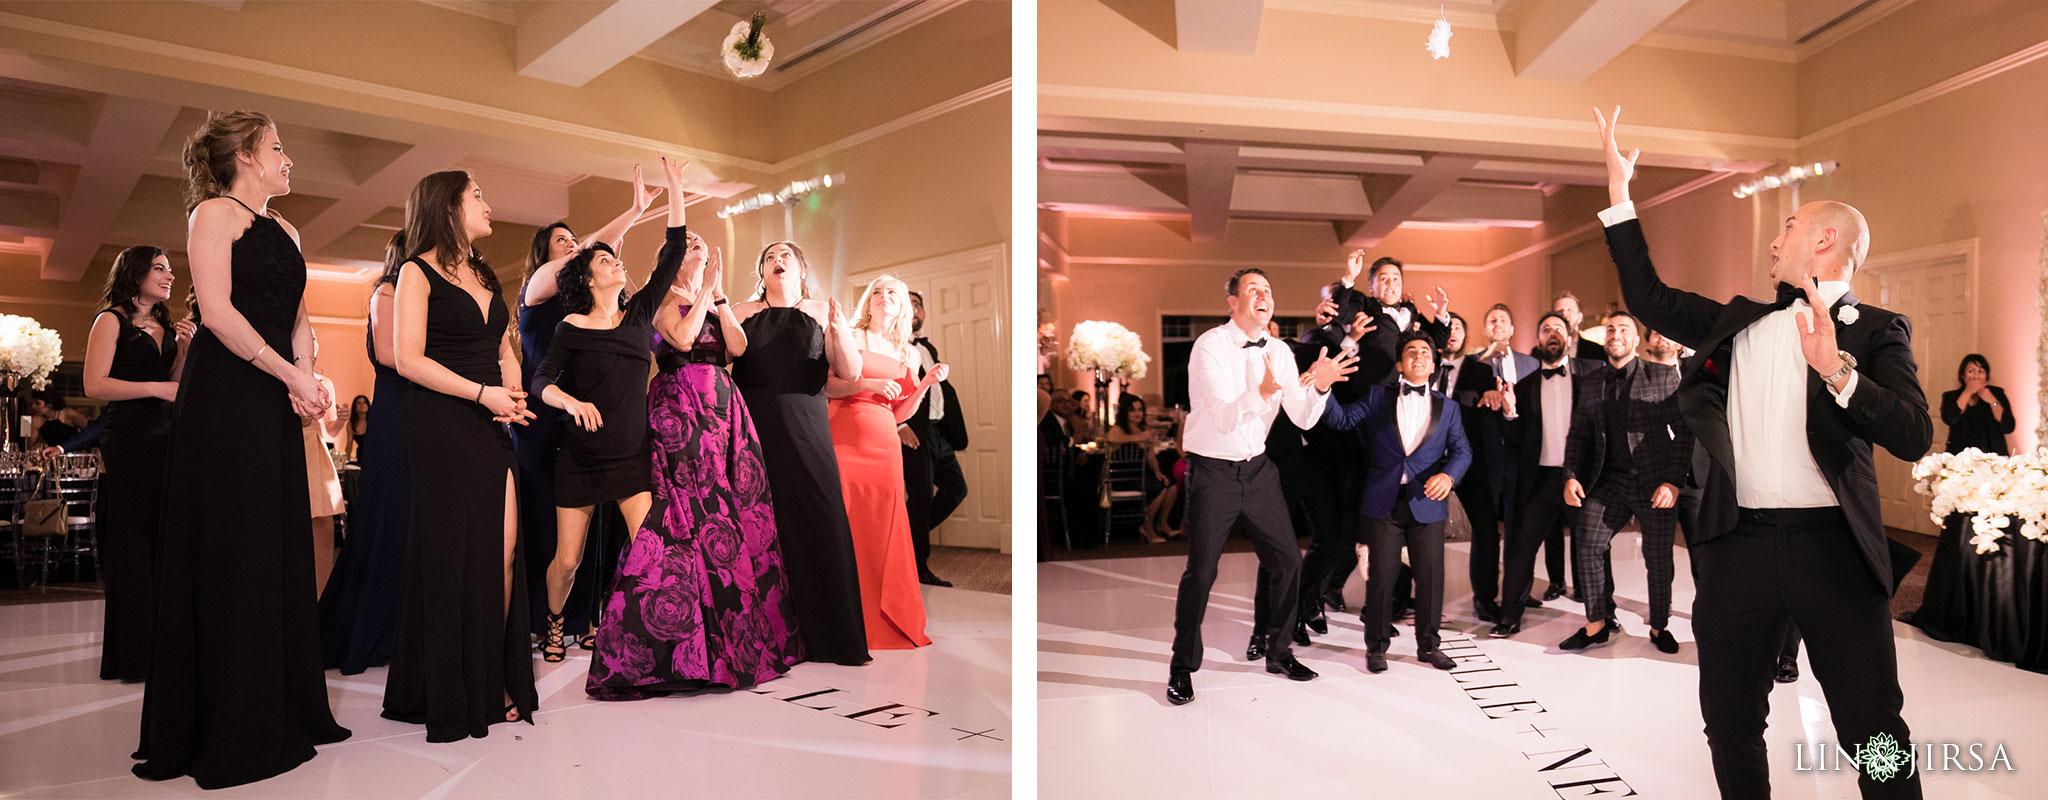 36 sherwood country club ventura county wedding reception photography